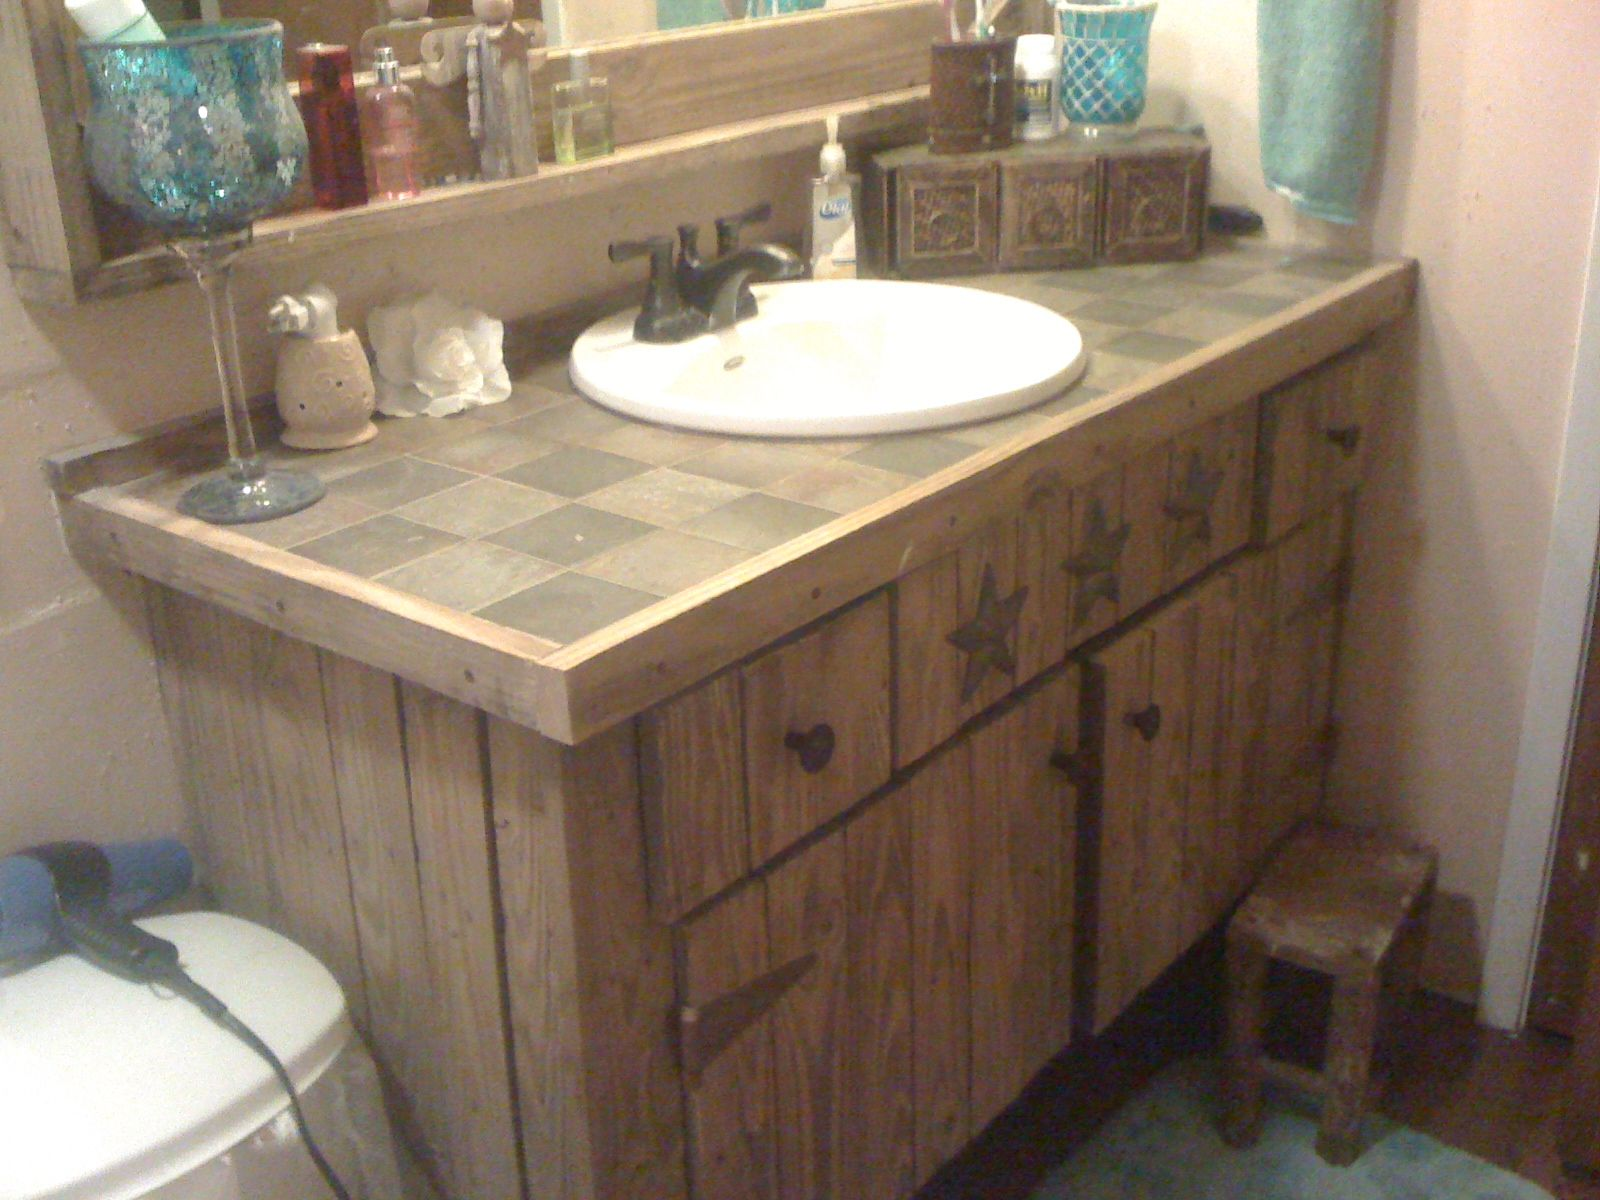 Bathroom Vanity Country Western Style Remake Of A White Bathroom Vanity And Sink Old Fence Barn White Vanity Bathroom Unique Bathroom Vanity Bathroom Vanity